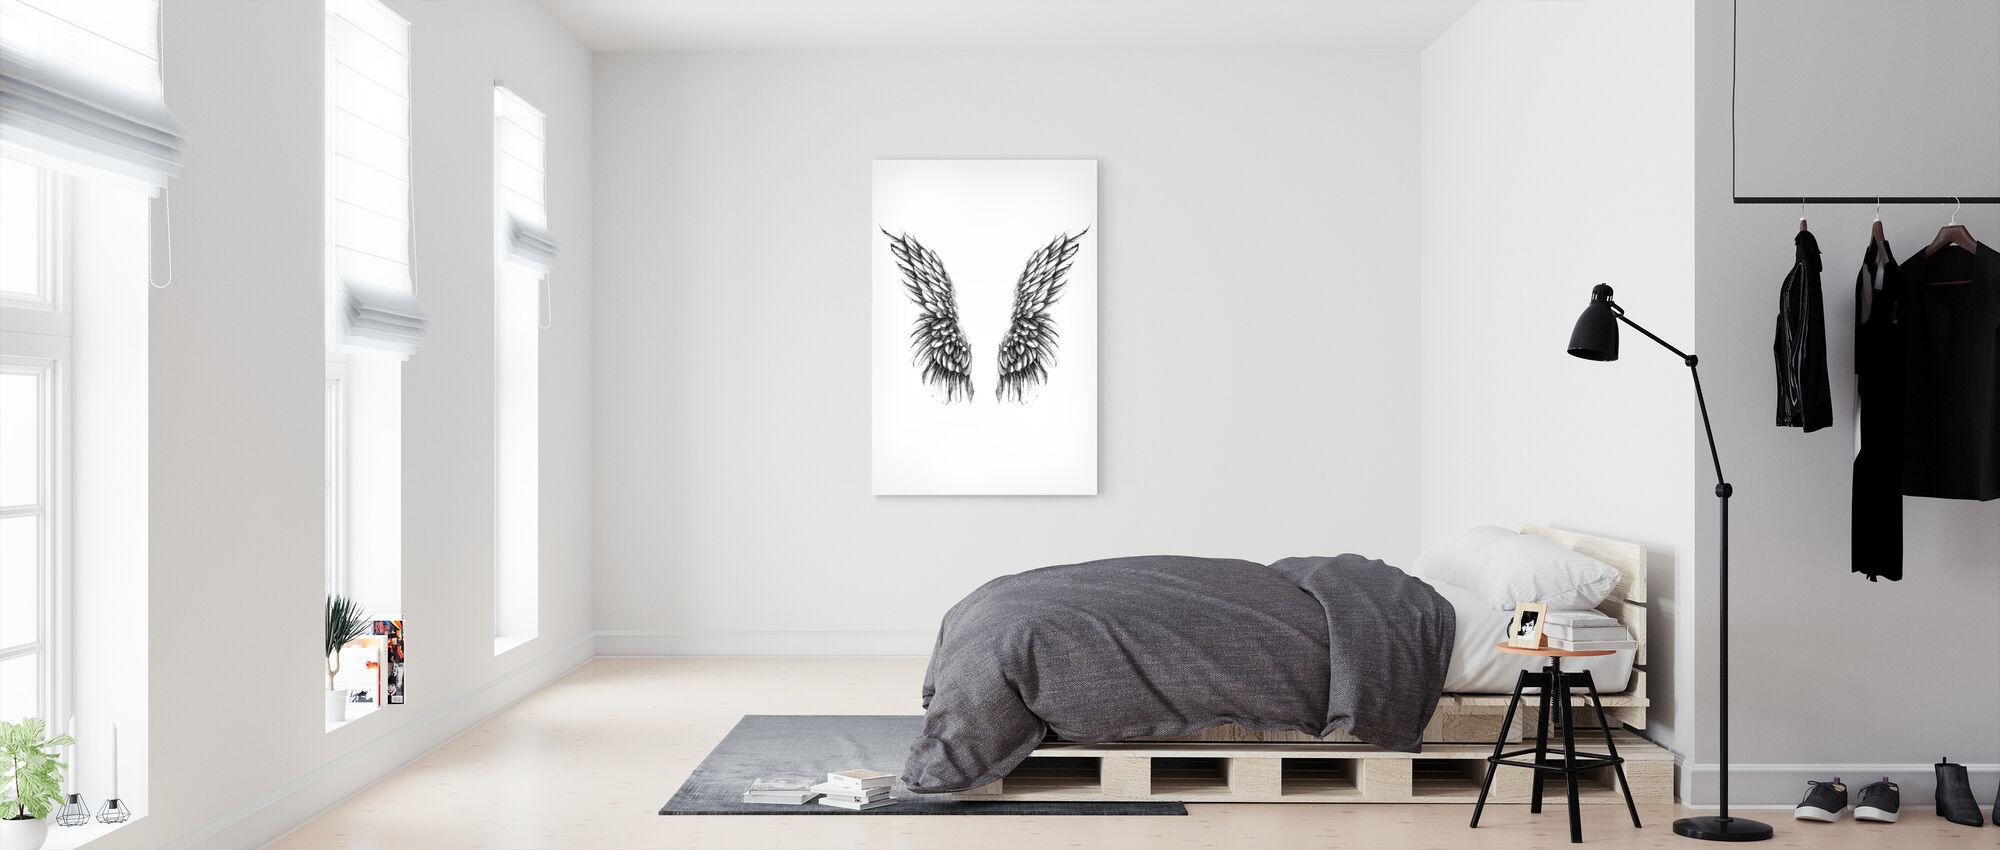 Watch over me - Canvas print - Bedroom